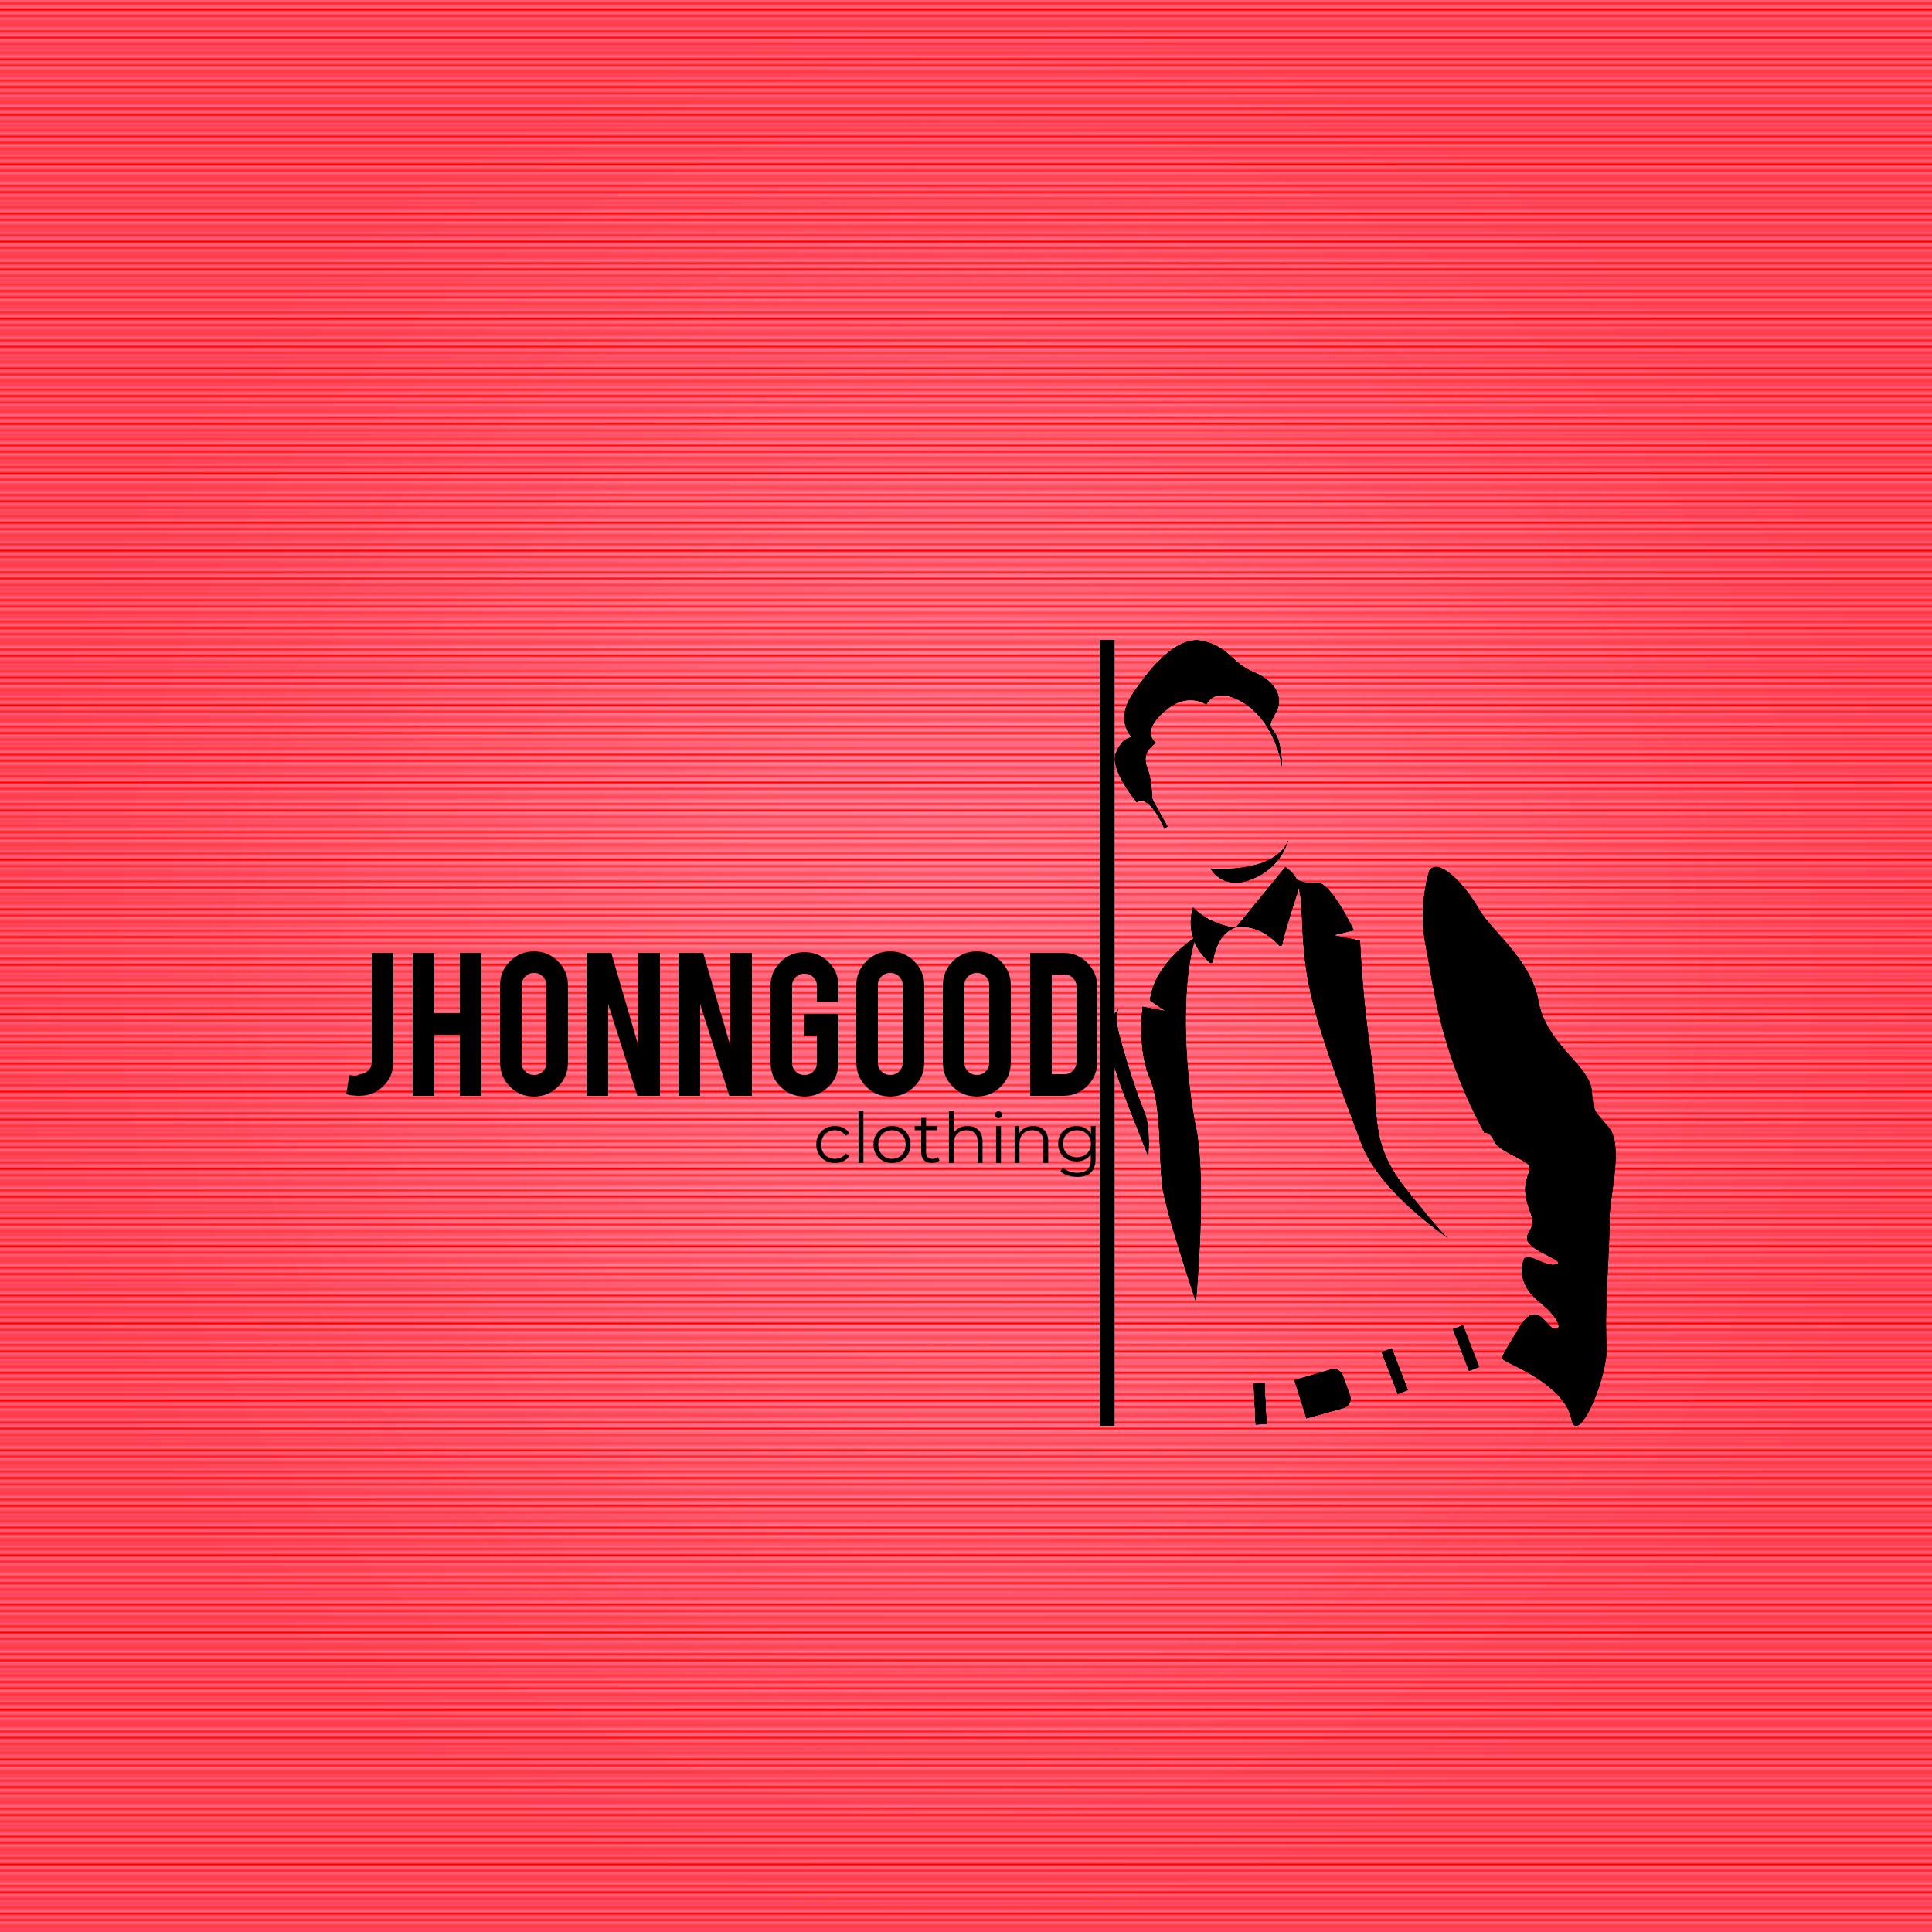 JHONNGOOD CLOTHING